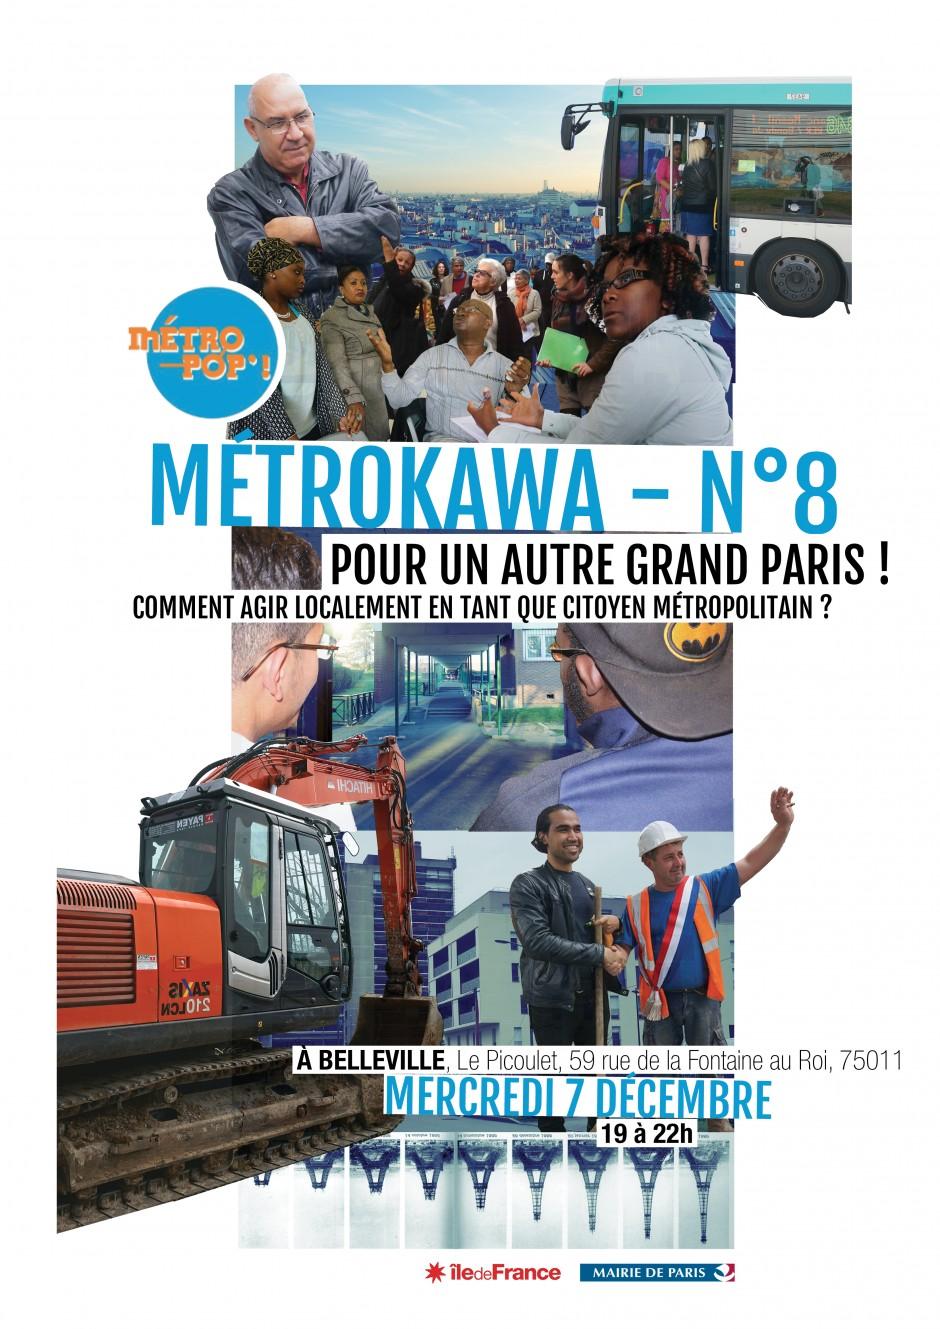 161122-metrokawa-n8-grand-format